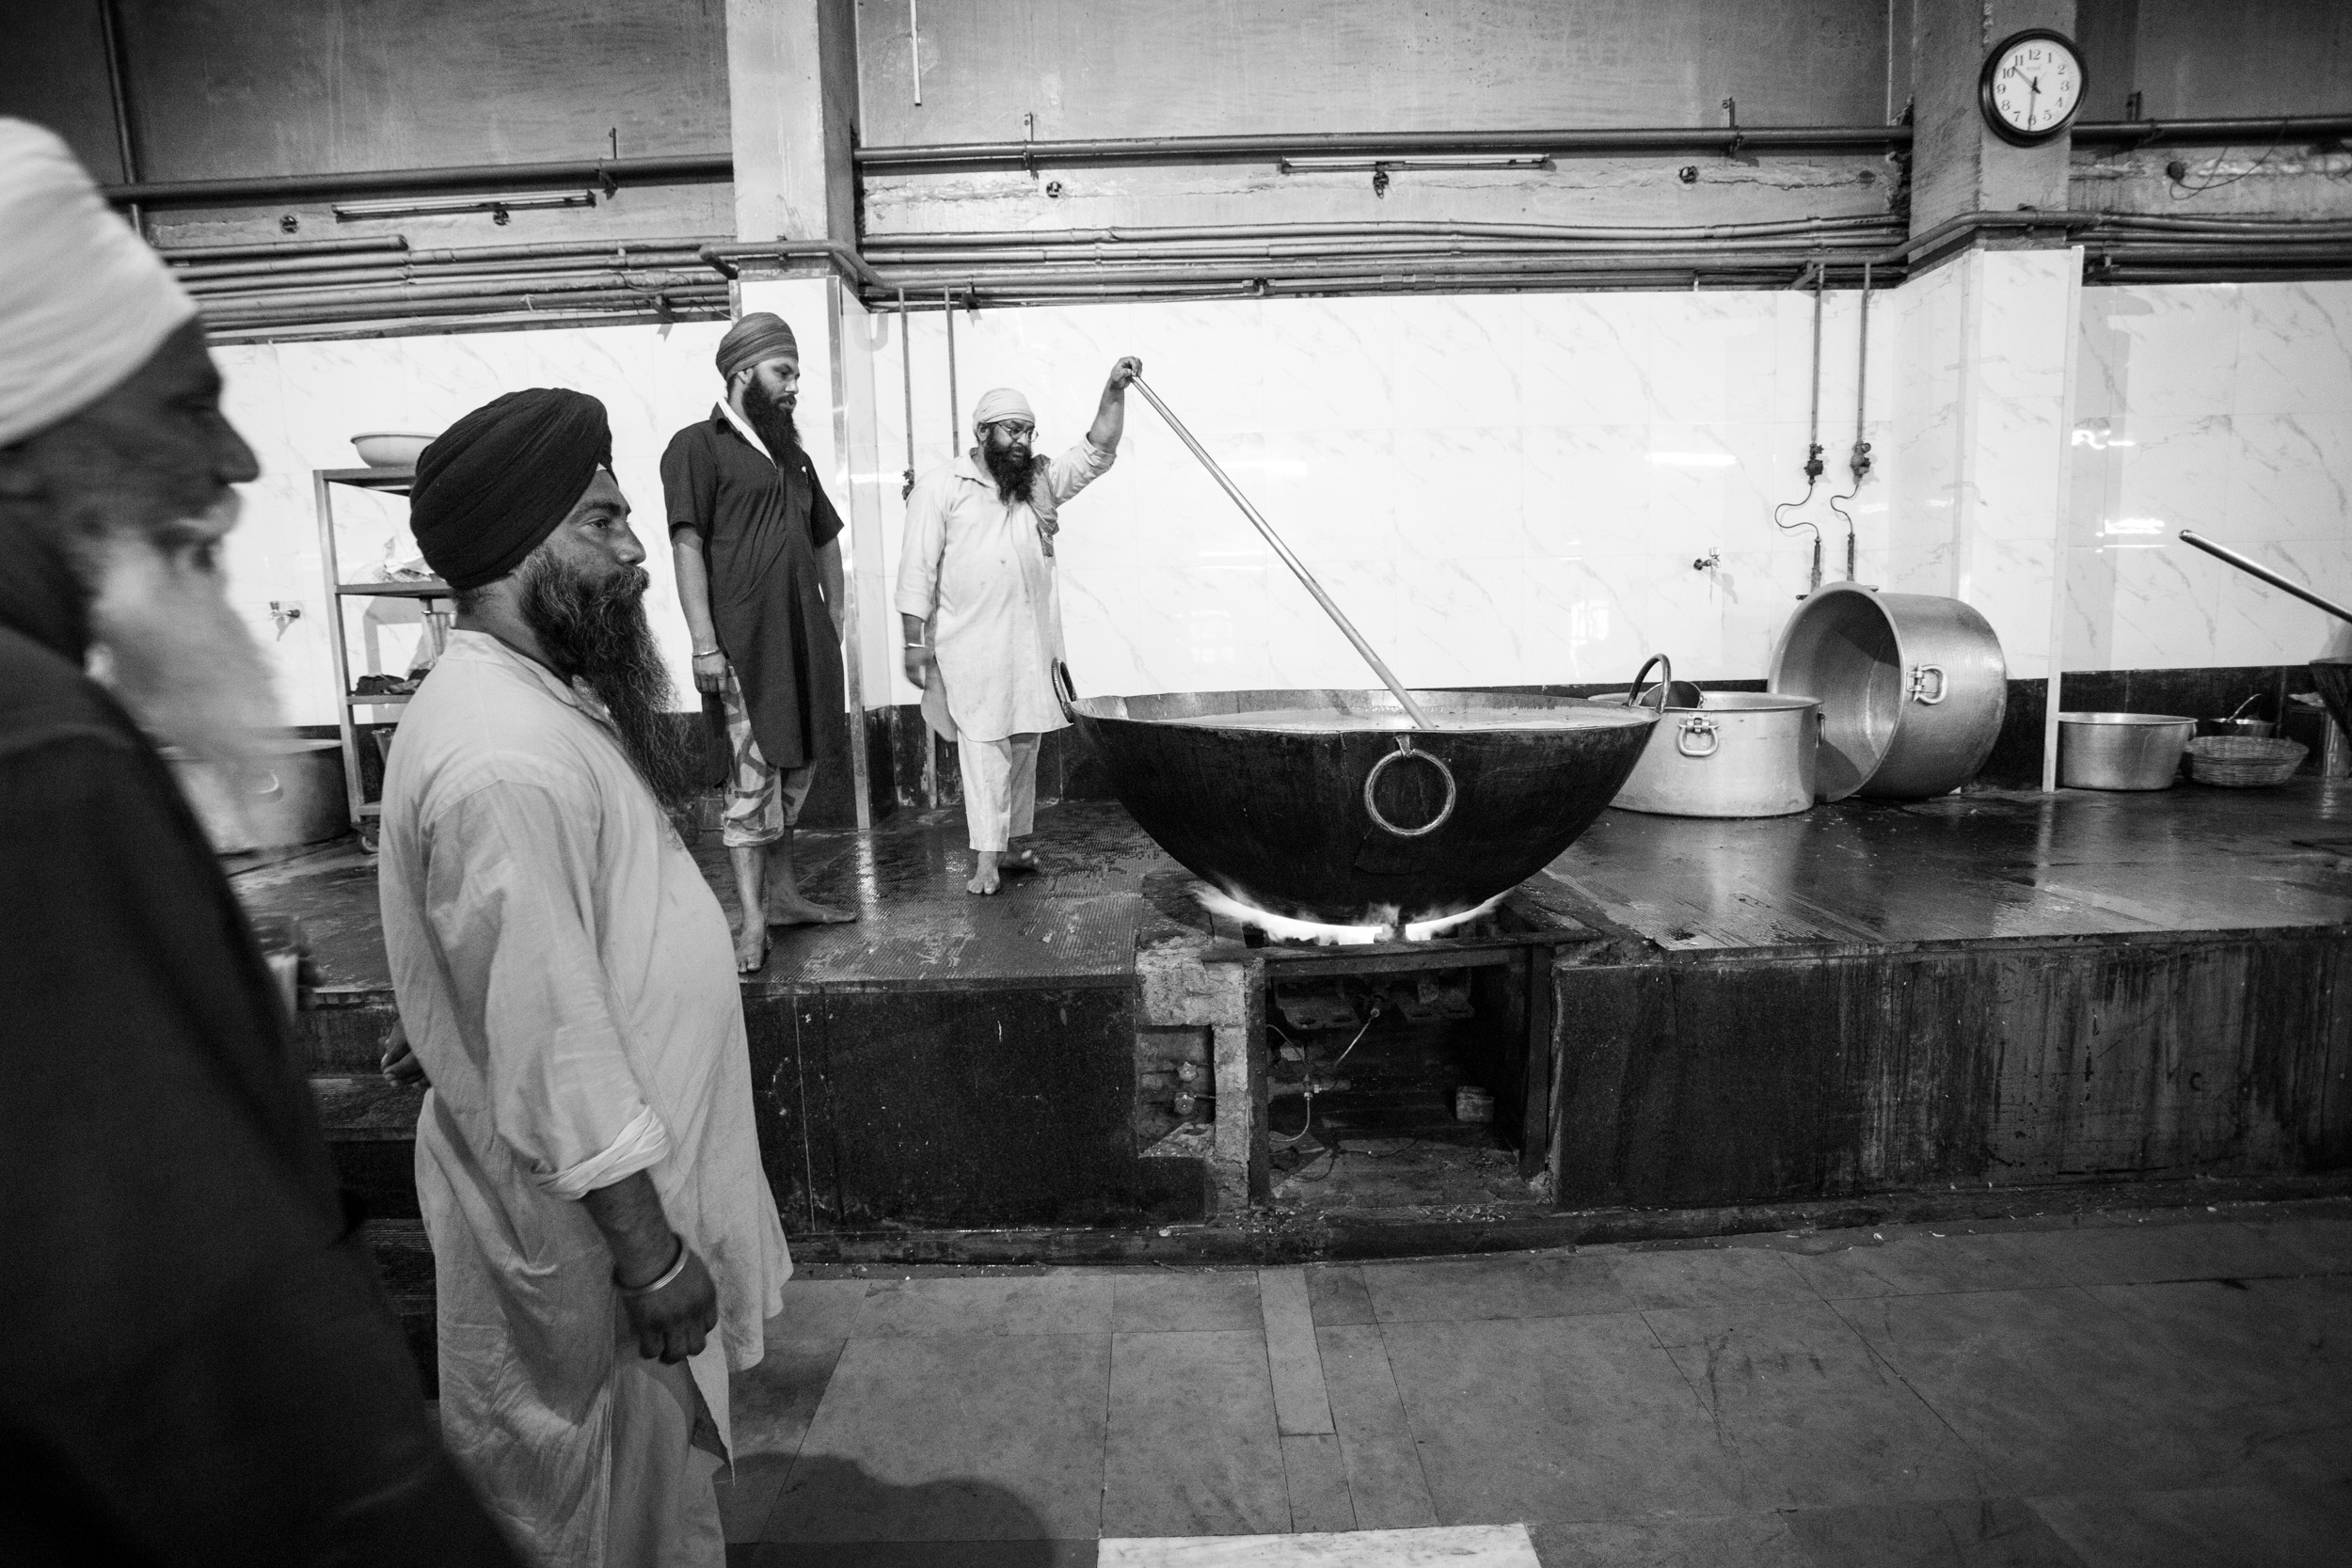 Huge vats of curry